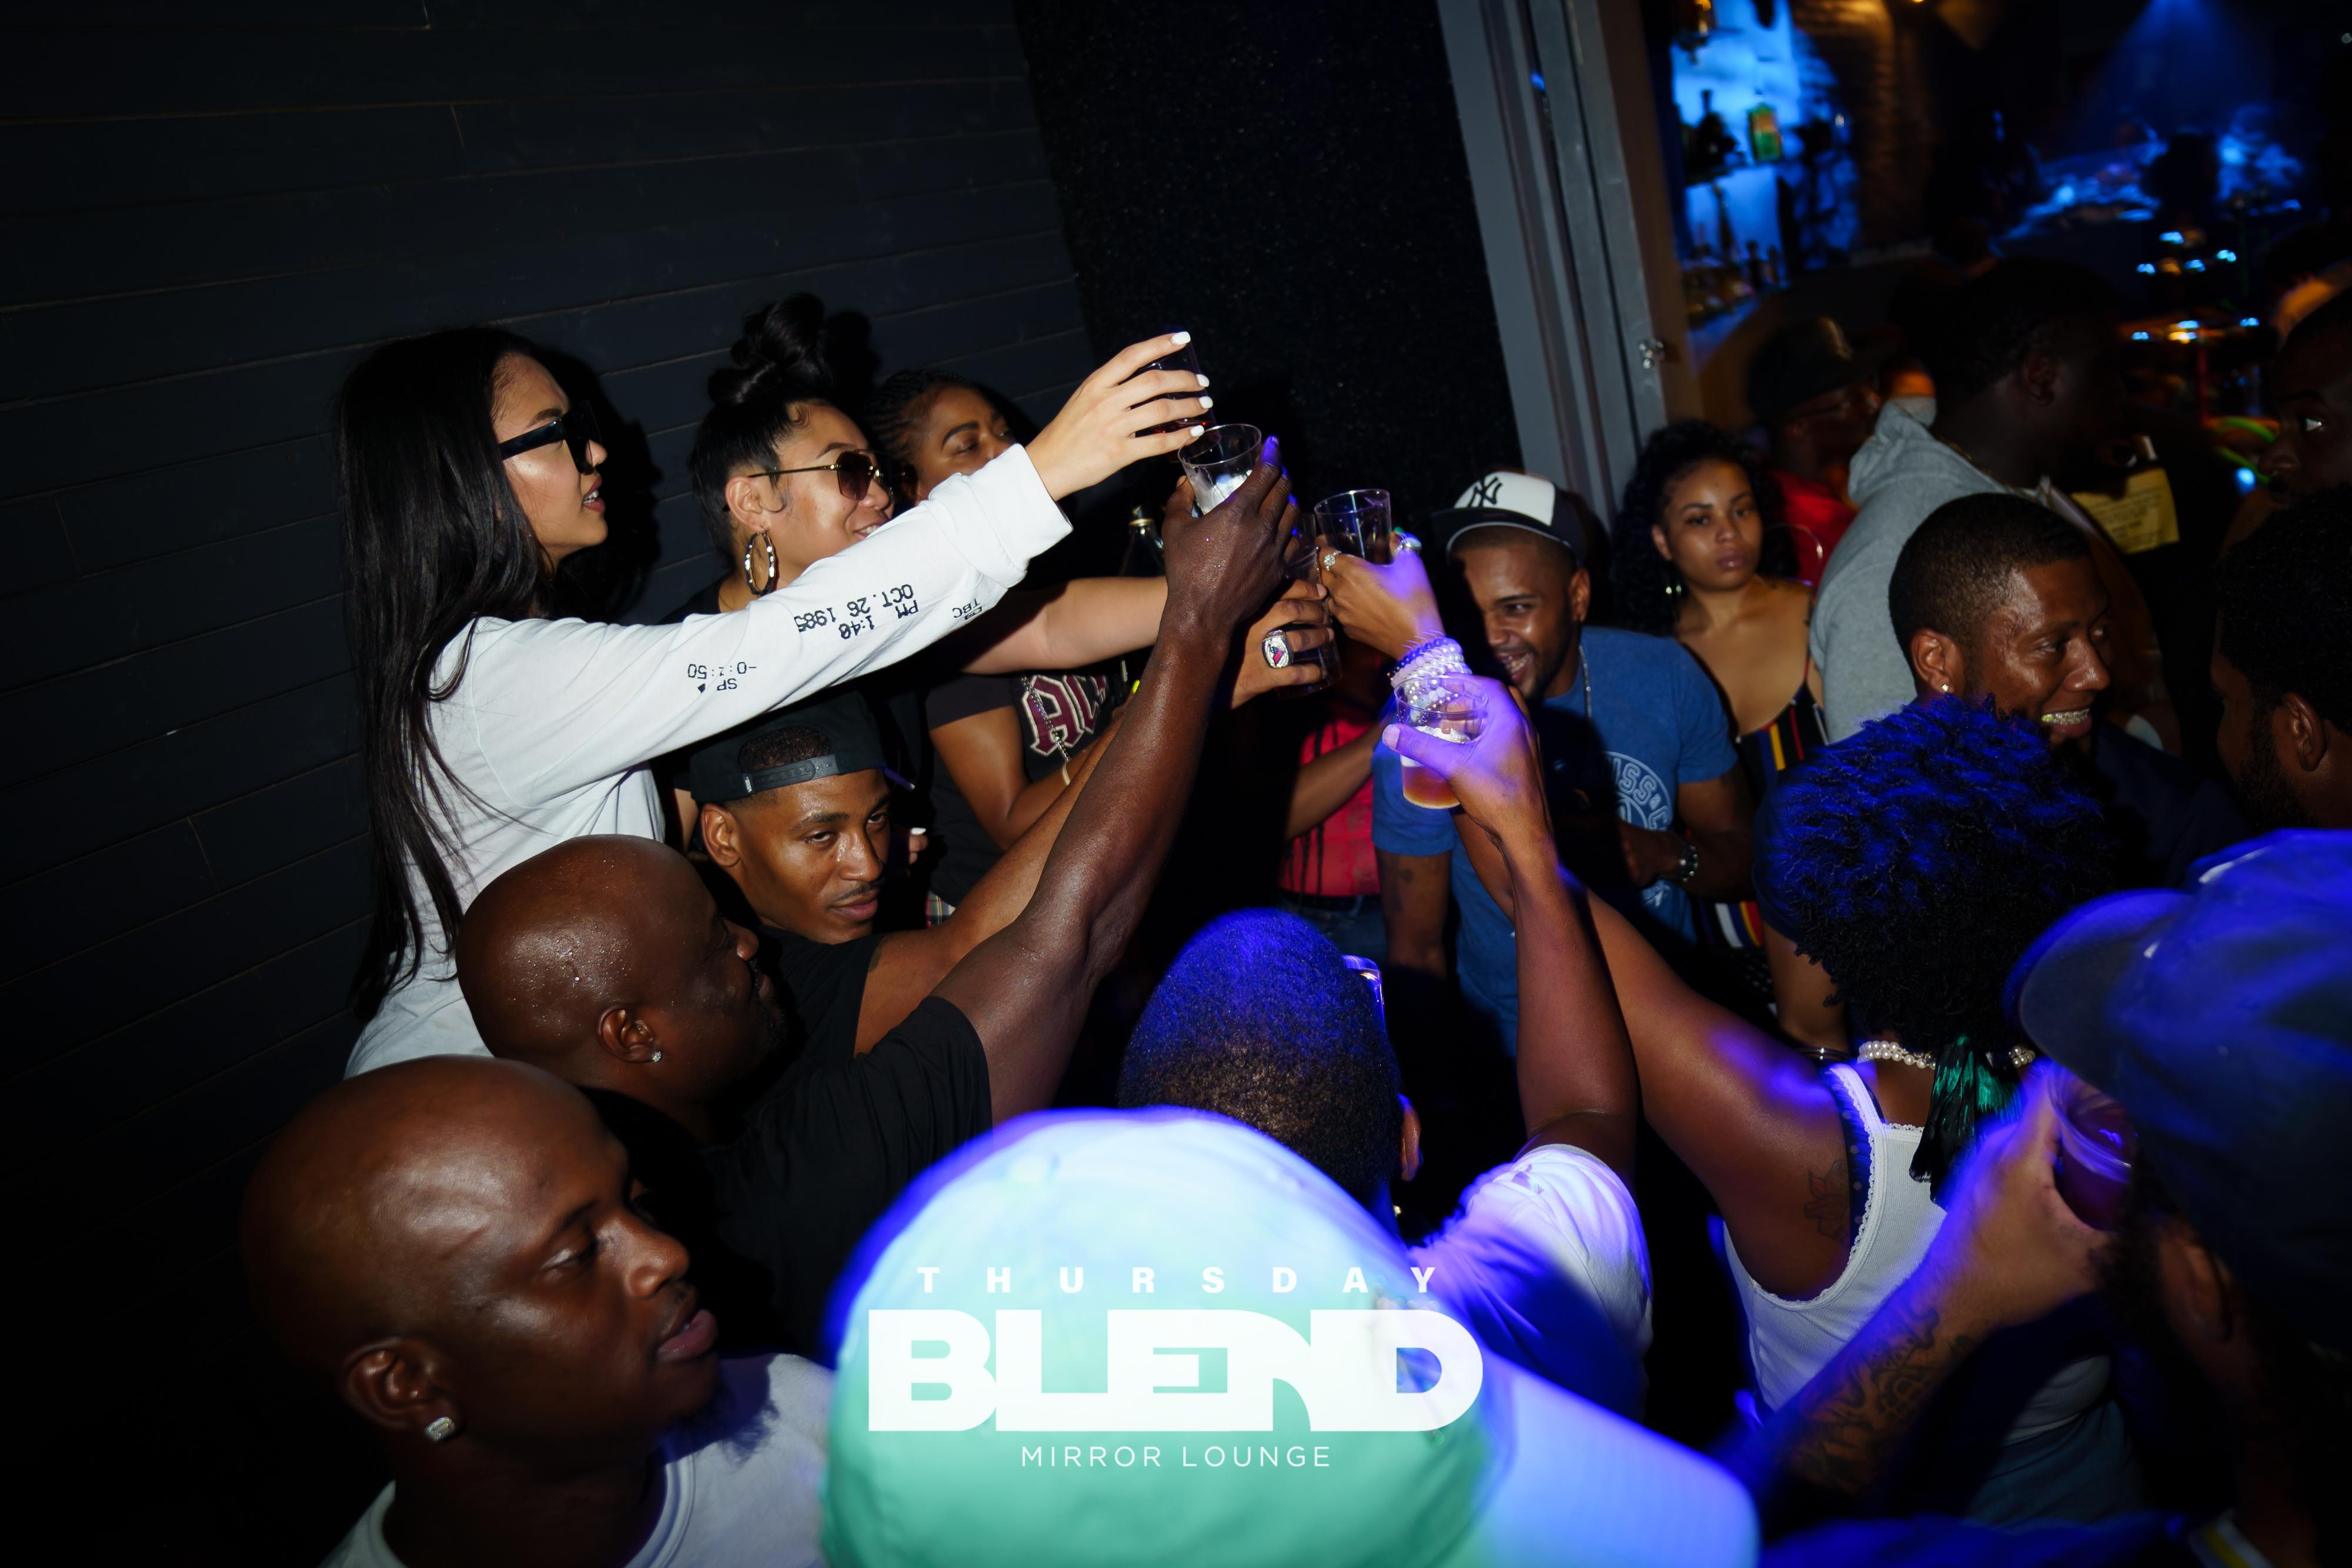 Thursday Blend at Mirror Lounge: DC's Best Thursday Night Vibe!